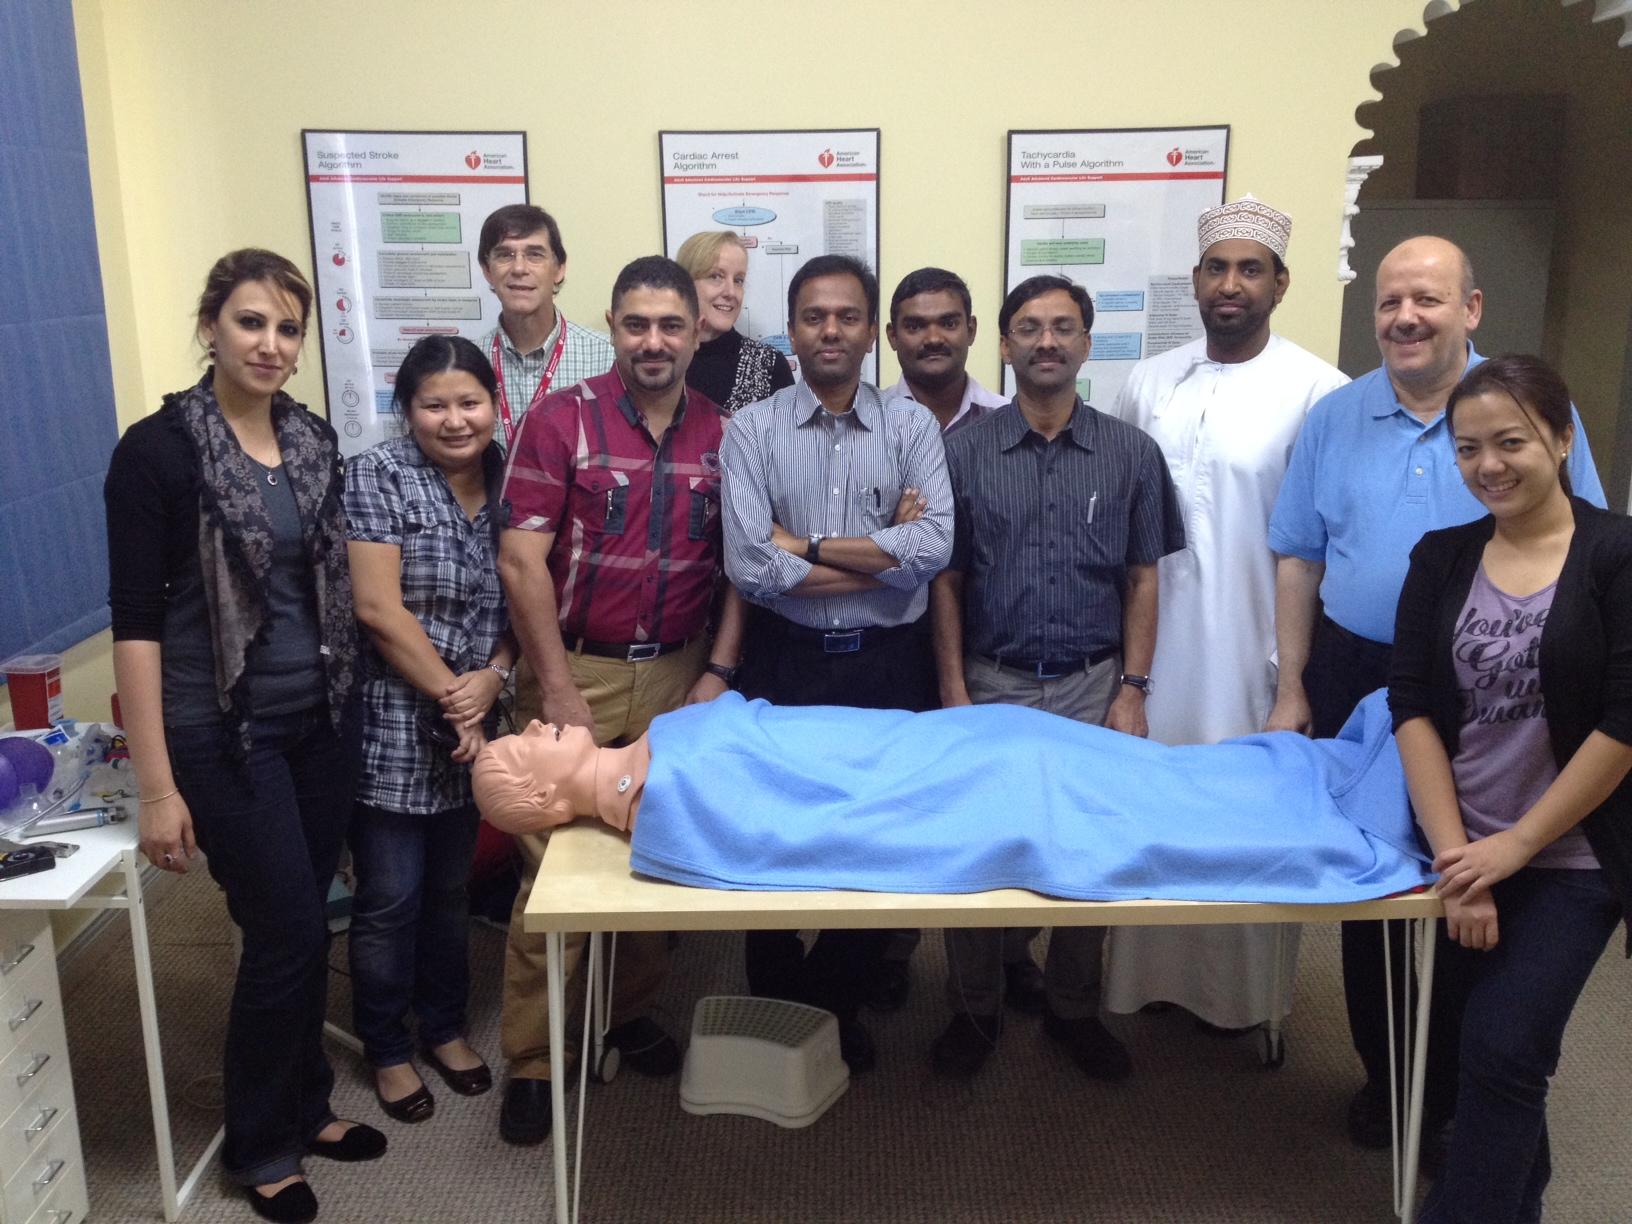 Testimonials Target Gulf CPR training